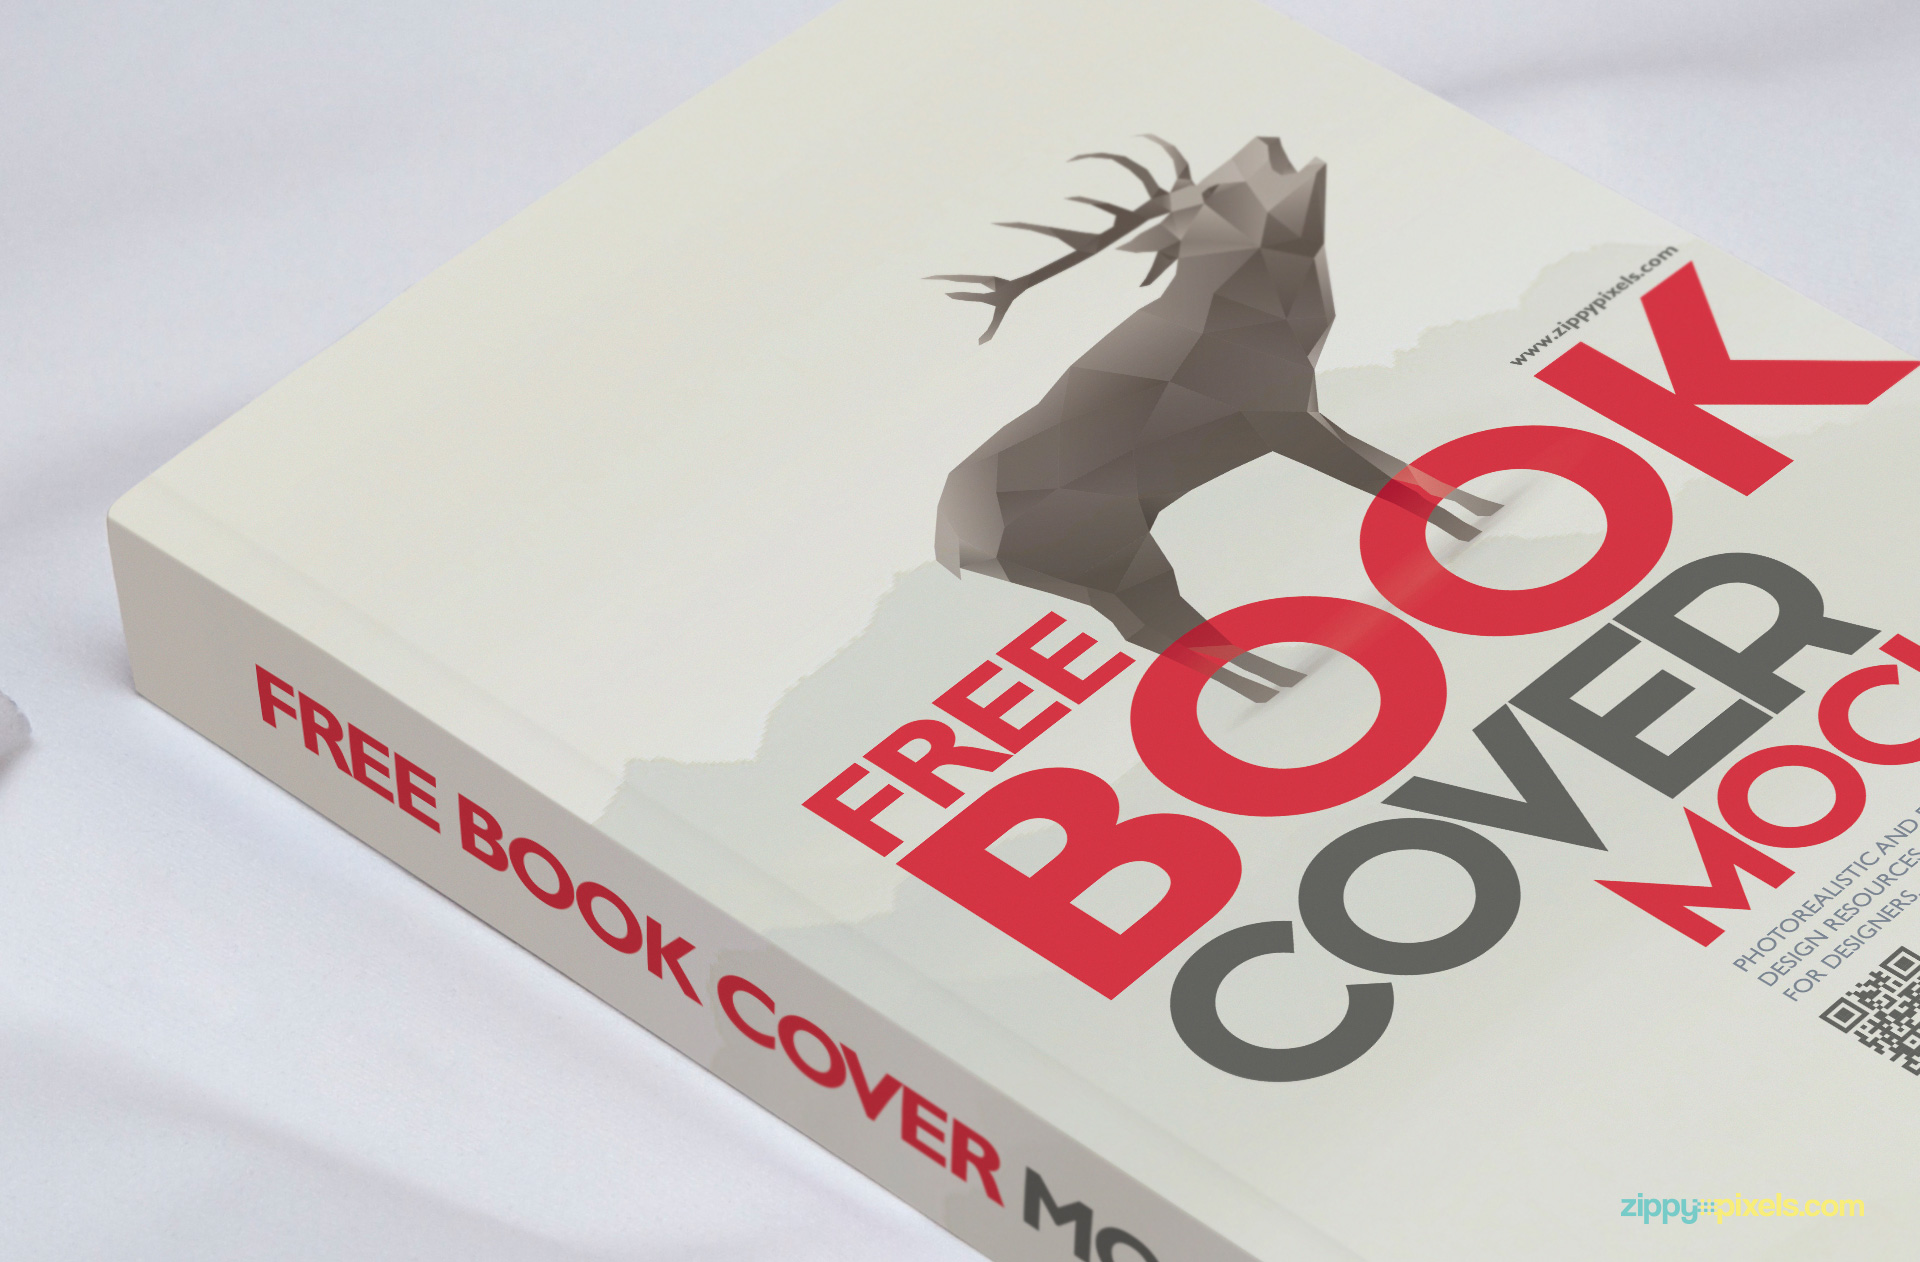 Perfectly designed book binding mockup.